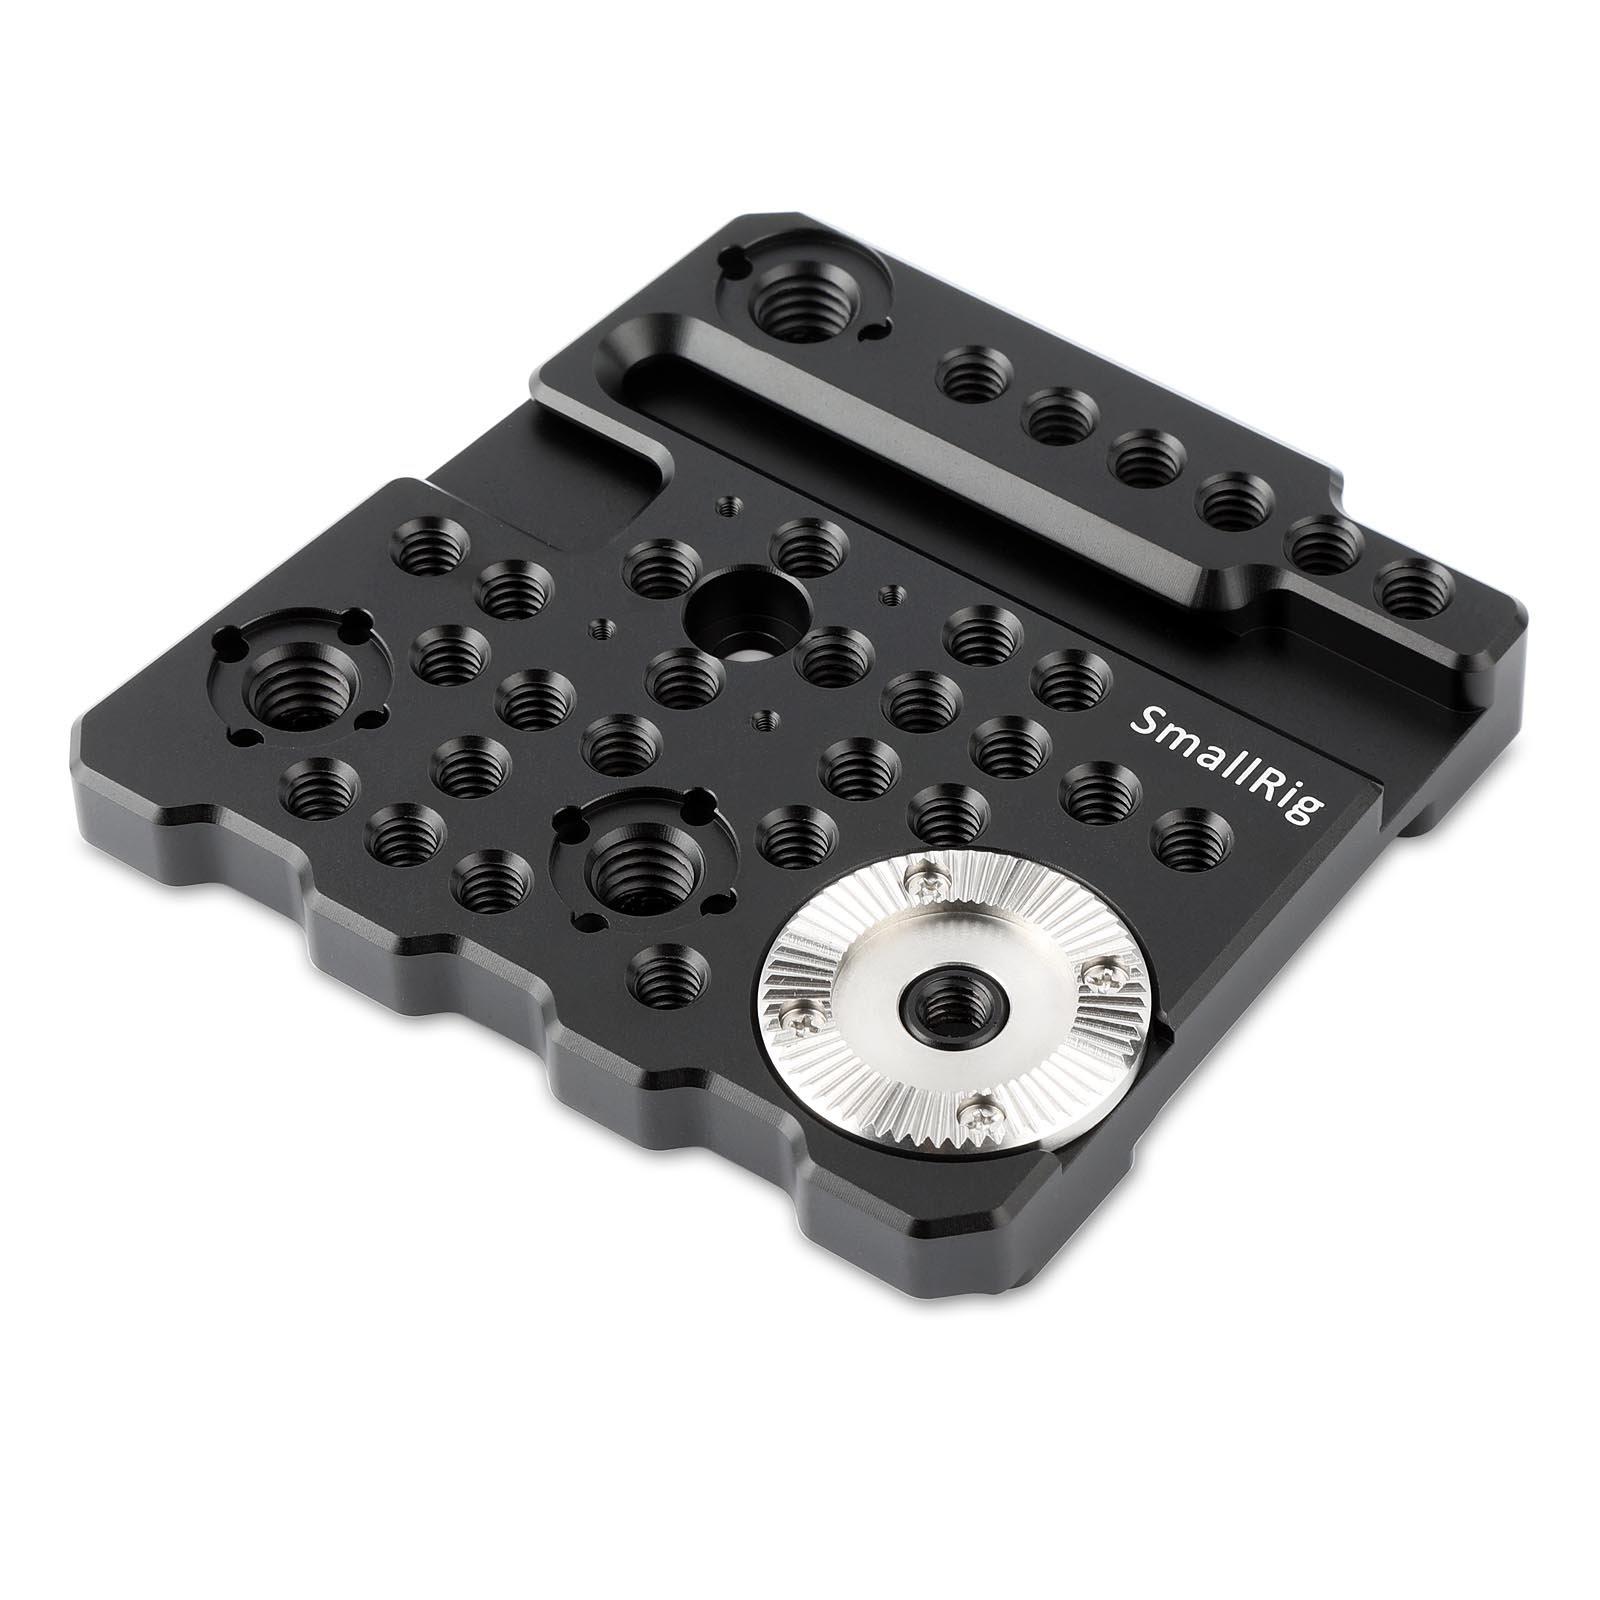 SMALLRIG Rosette Side Plate for BlackMagic URSA Mini, URSA Mini Pro Camera- 1854 by SmallRig (Image #2)